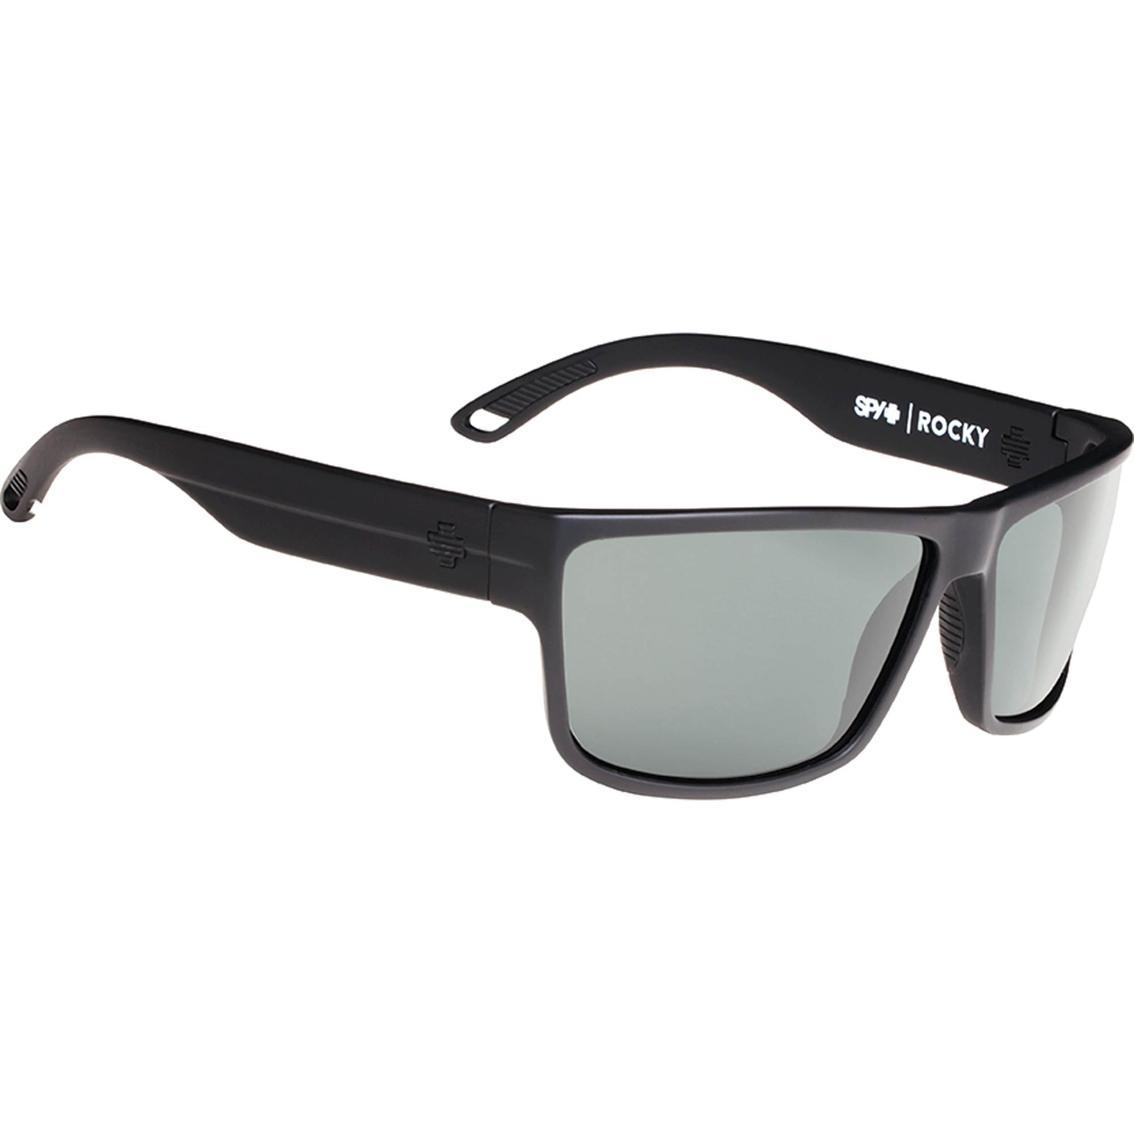 8da6eb7b8d Spy Optic Rocky Plastic Rectangle Happy Lens Sunglasses 673248374863 ...